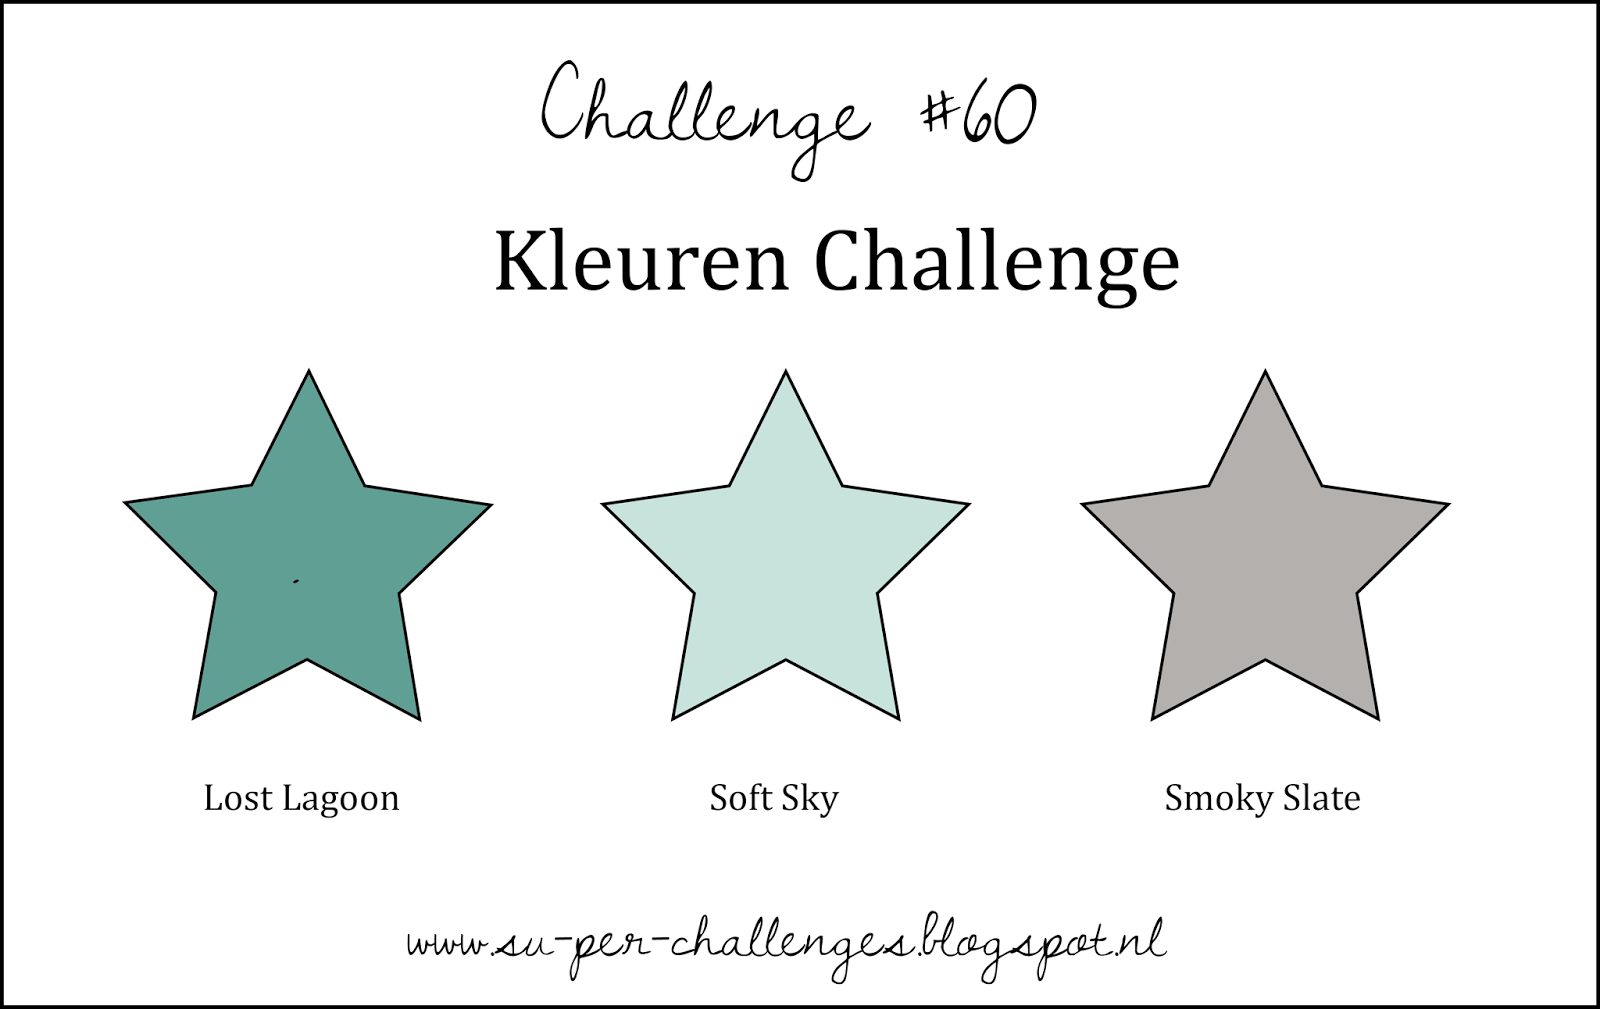 http://su-per-challenges.blogspot.nl/2014/10/challenge-60-kleuren.html